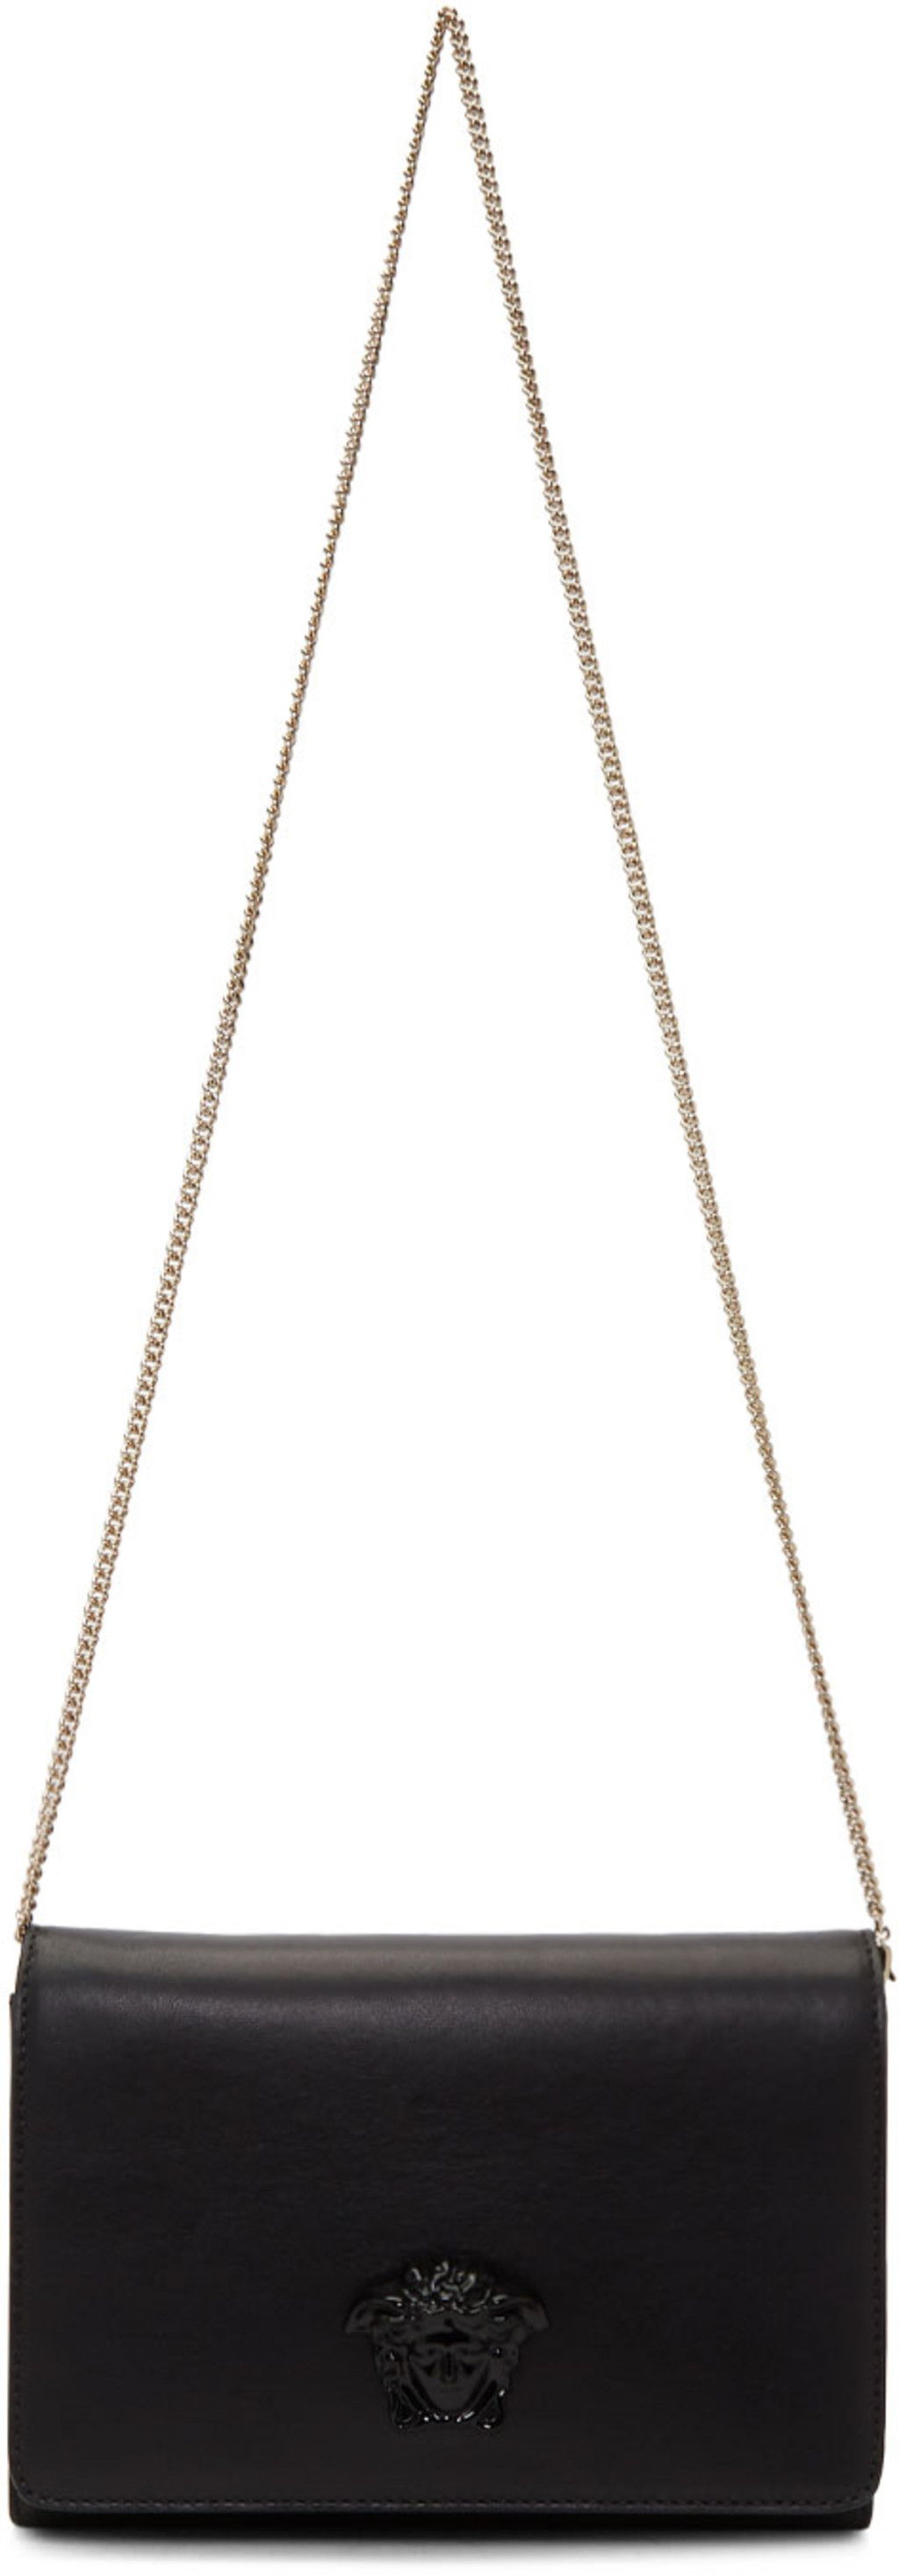 Black Tribute Medusa Wallet Chain Bag Versace esG07Pw